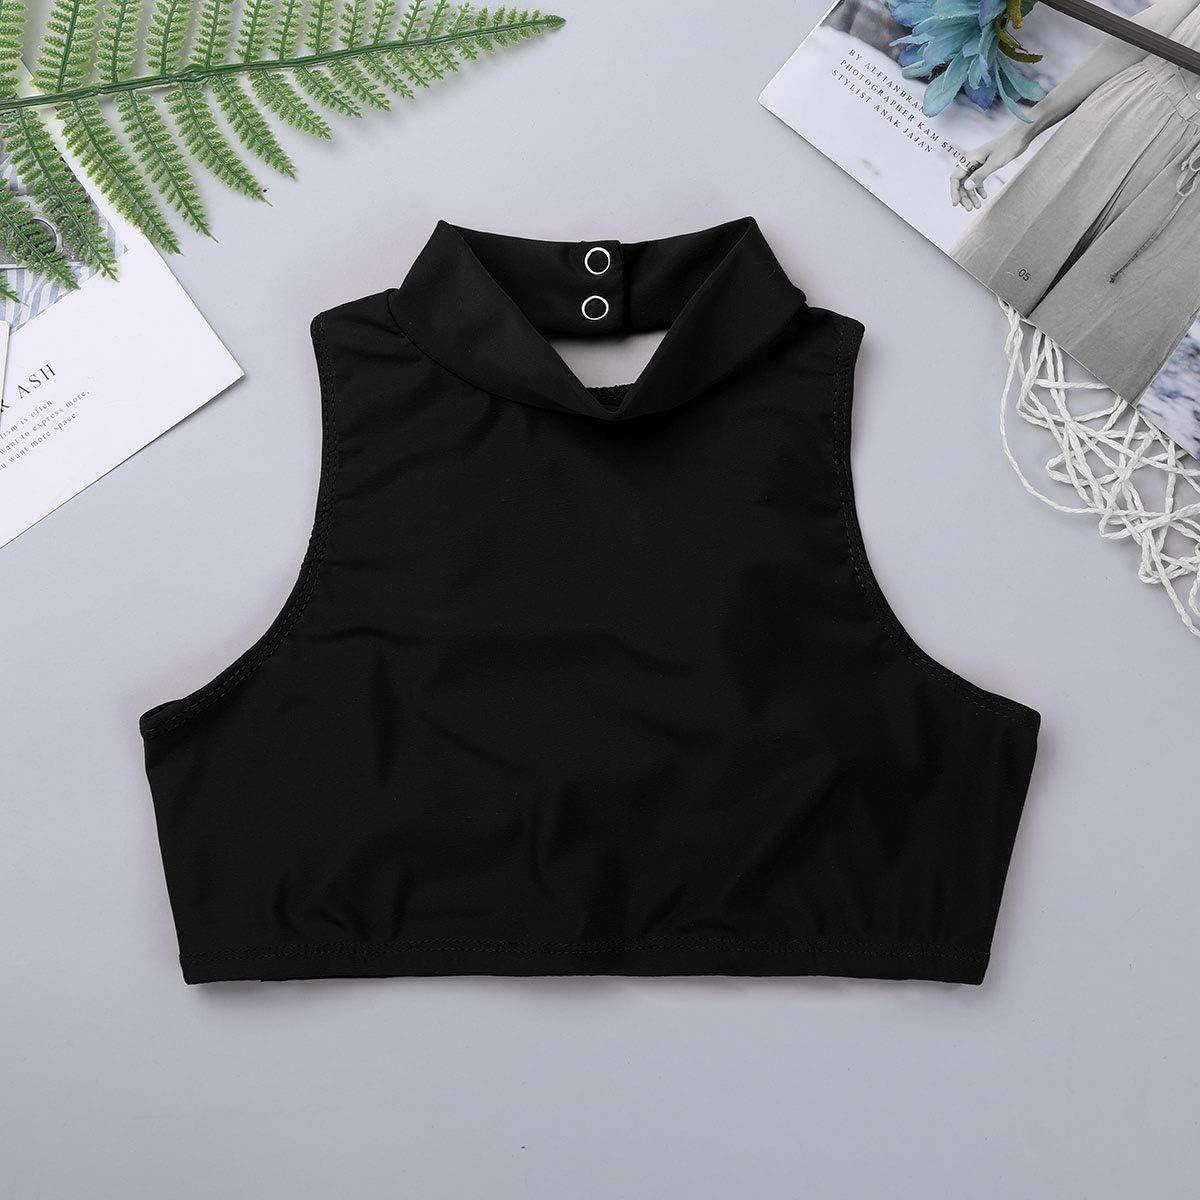 moily Big Girls High Turtleneck Strappy Back Crop Top Athletic Tank Midi Sports Bra Gymnastics Dancewear Black 12